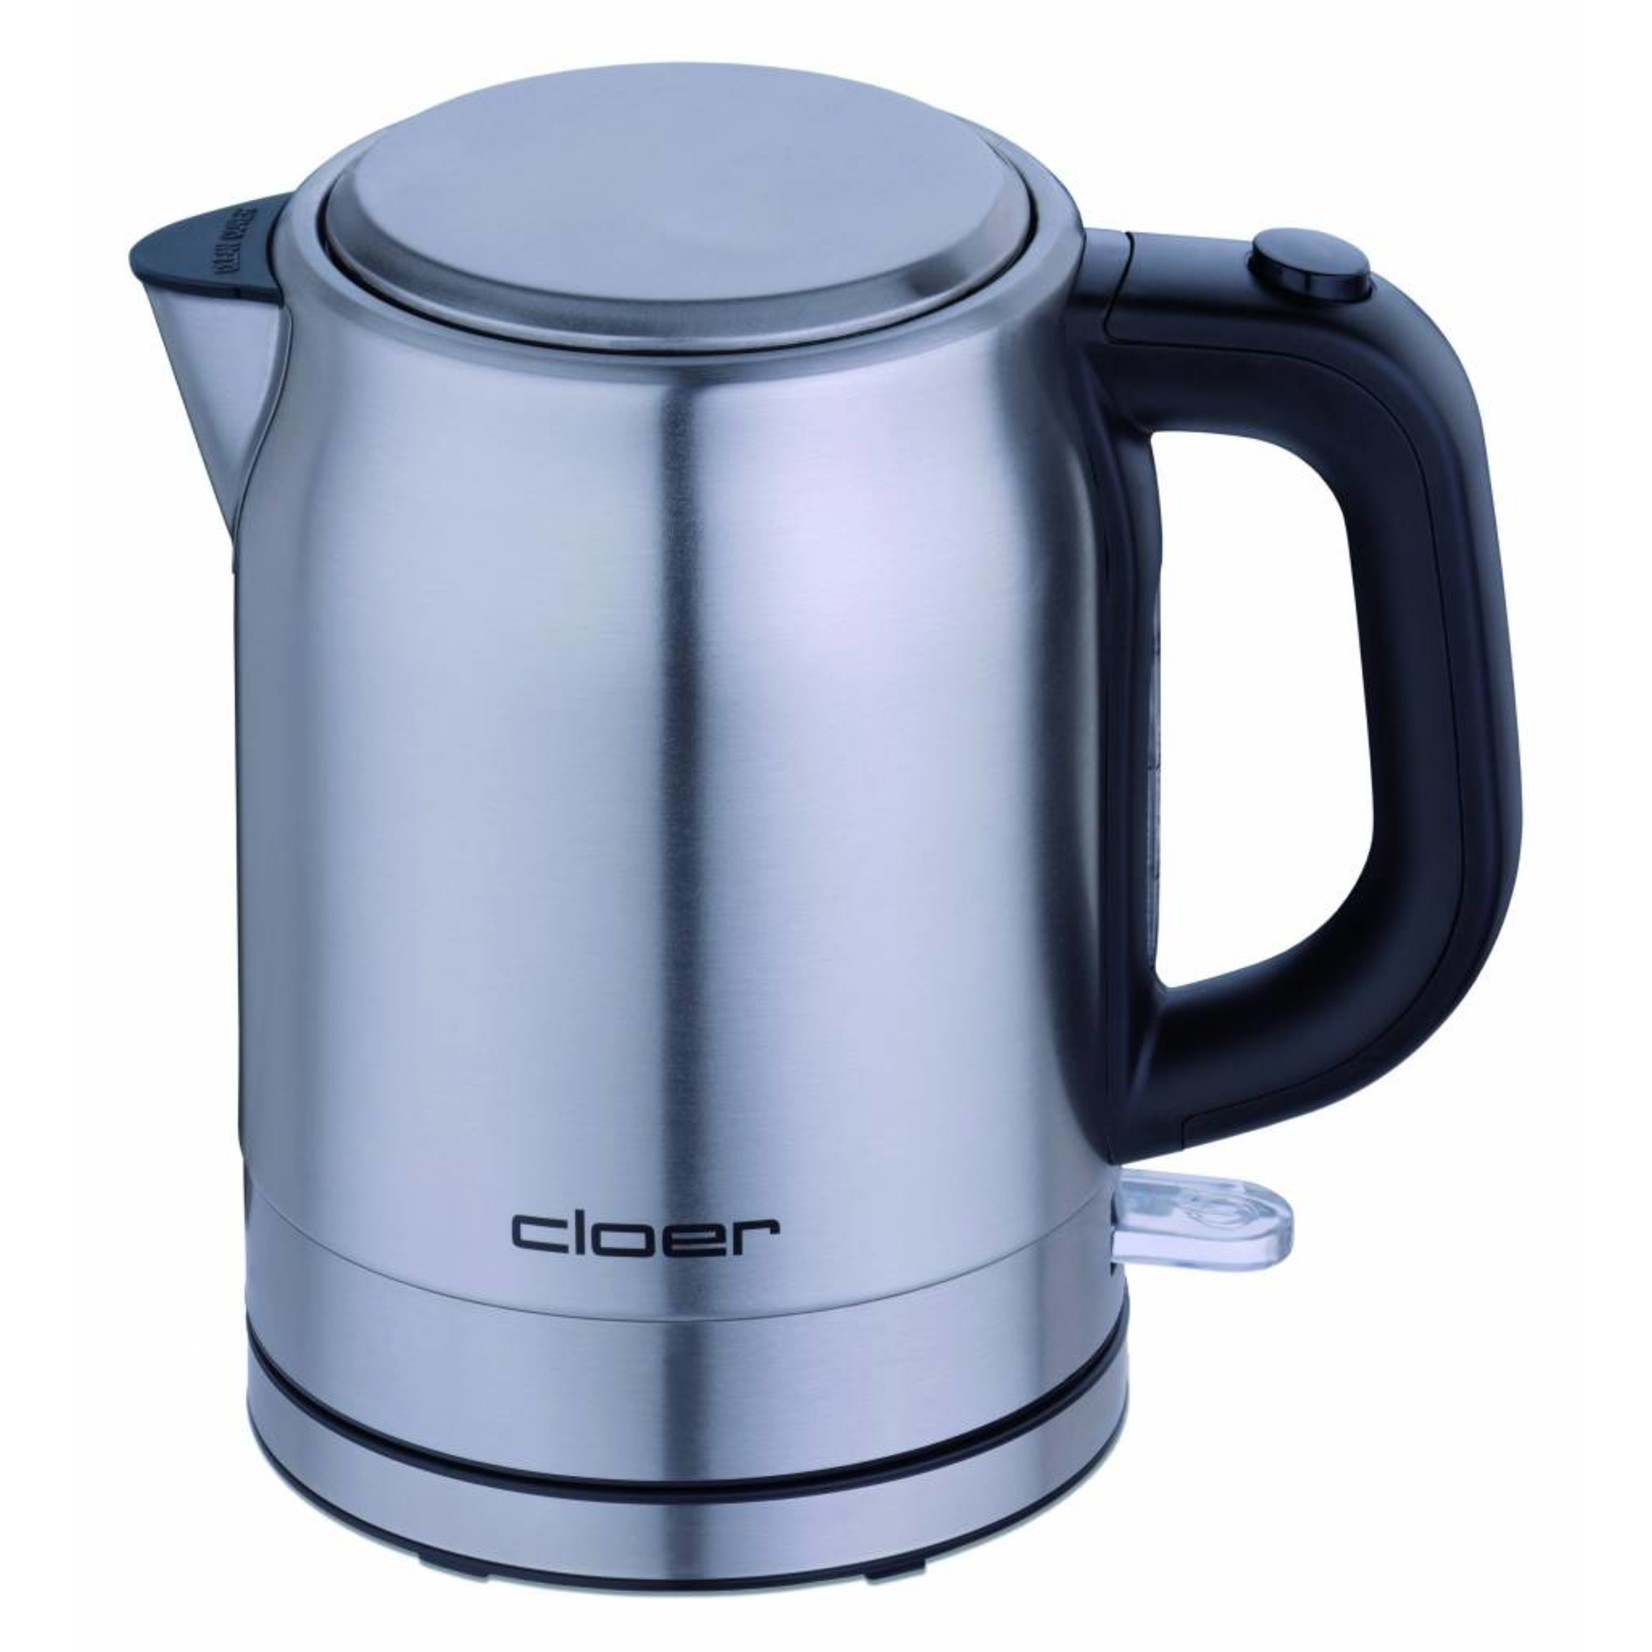 Cloer Cloer waterkoker